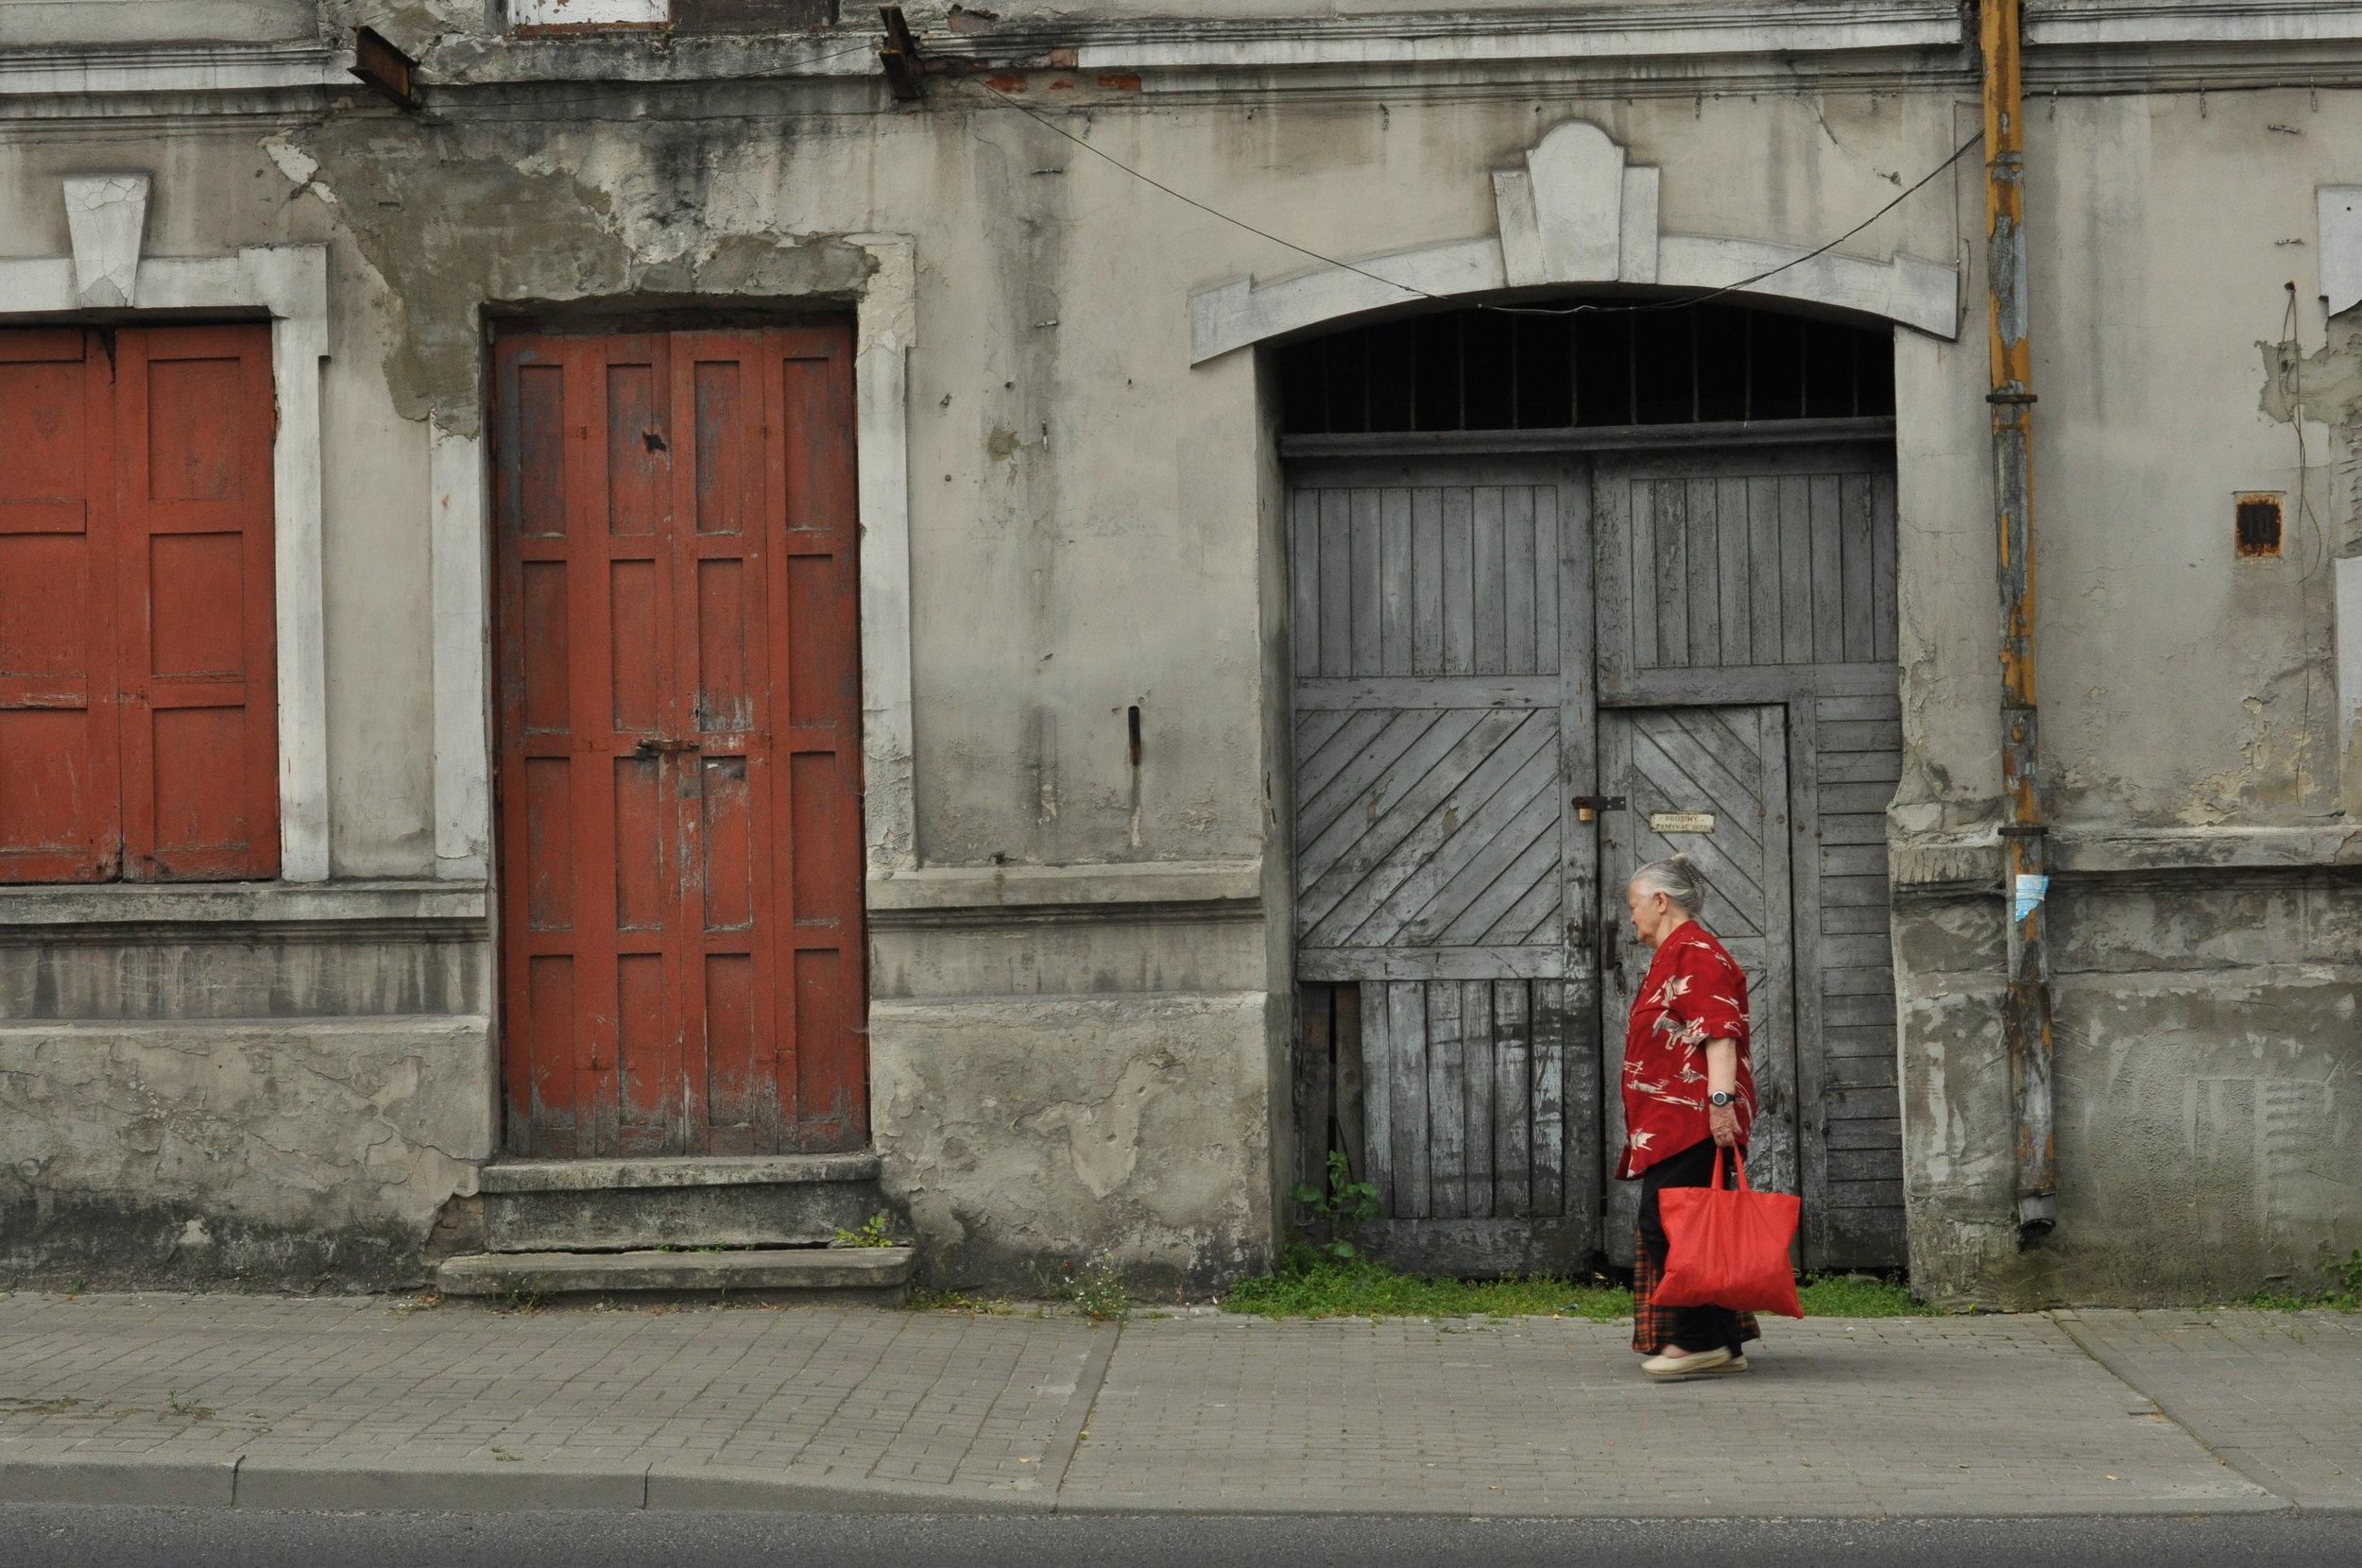 Street scene in Chelm, Poland